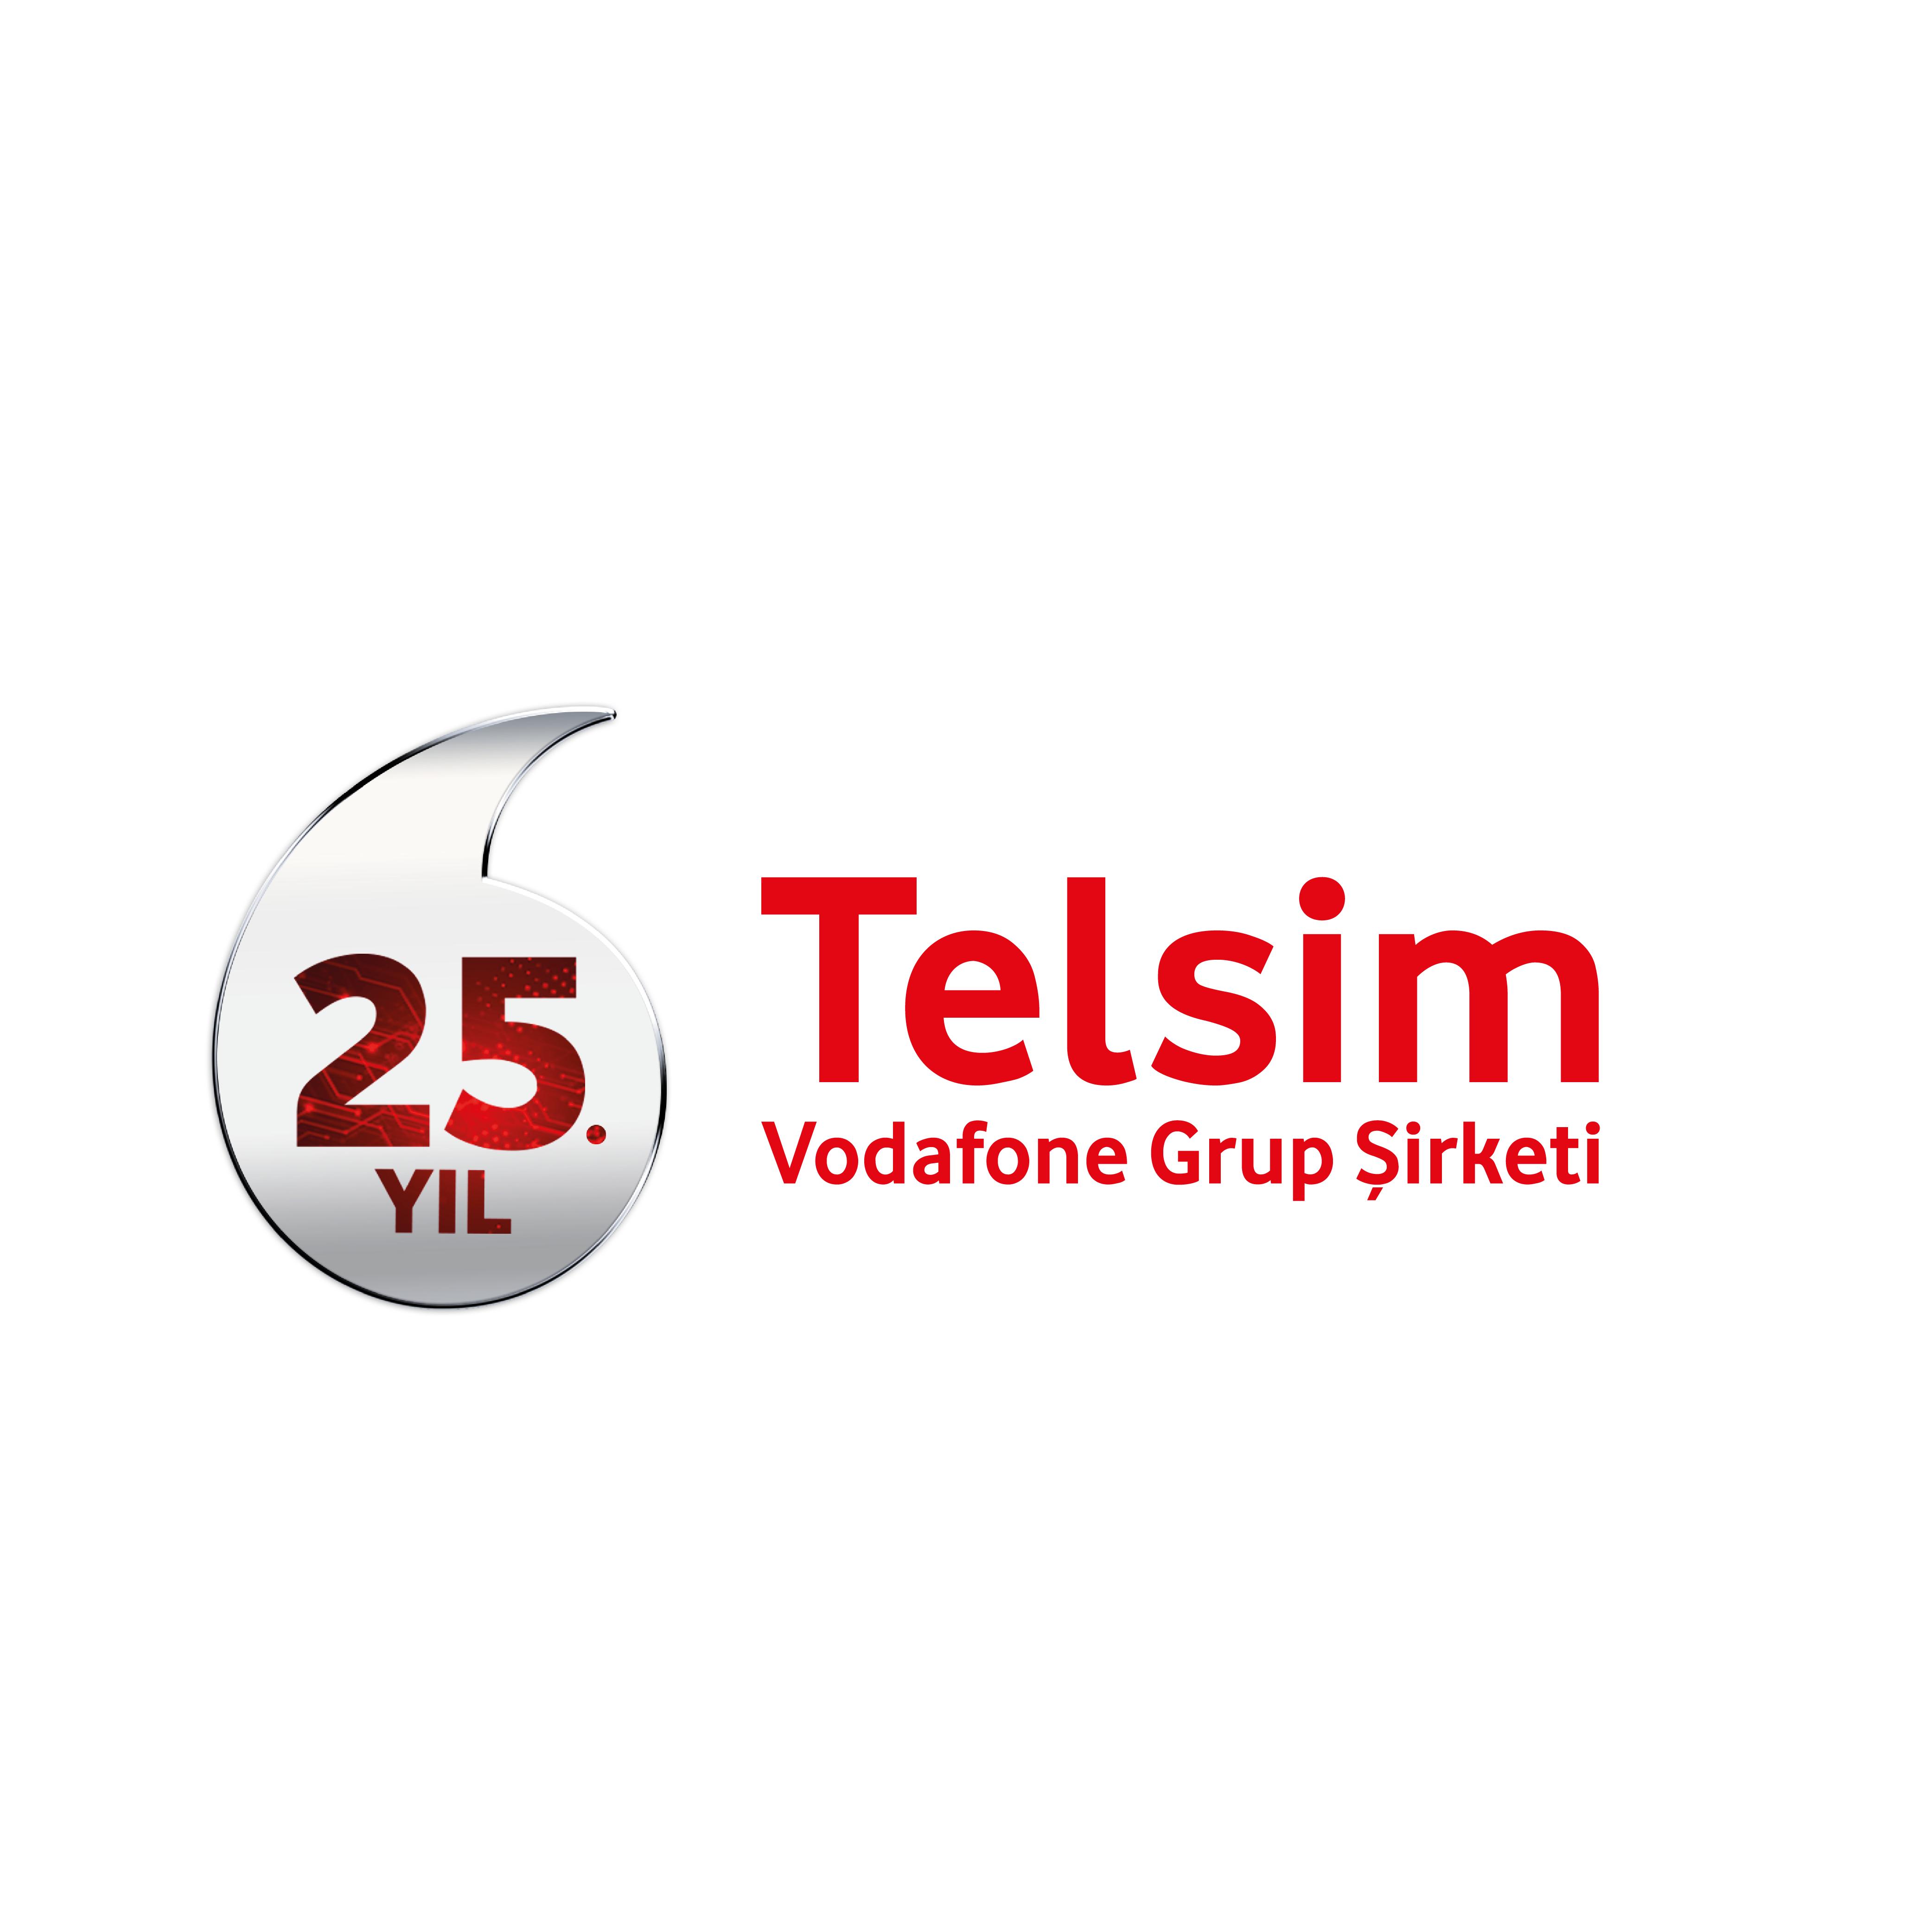 Vodafone Mobile Operations LTD logo